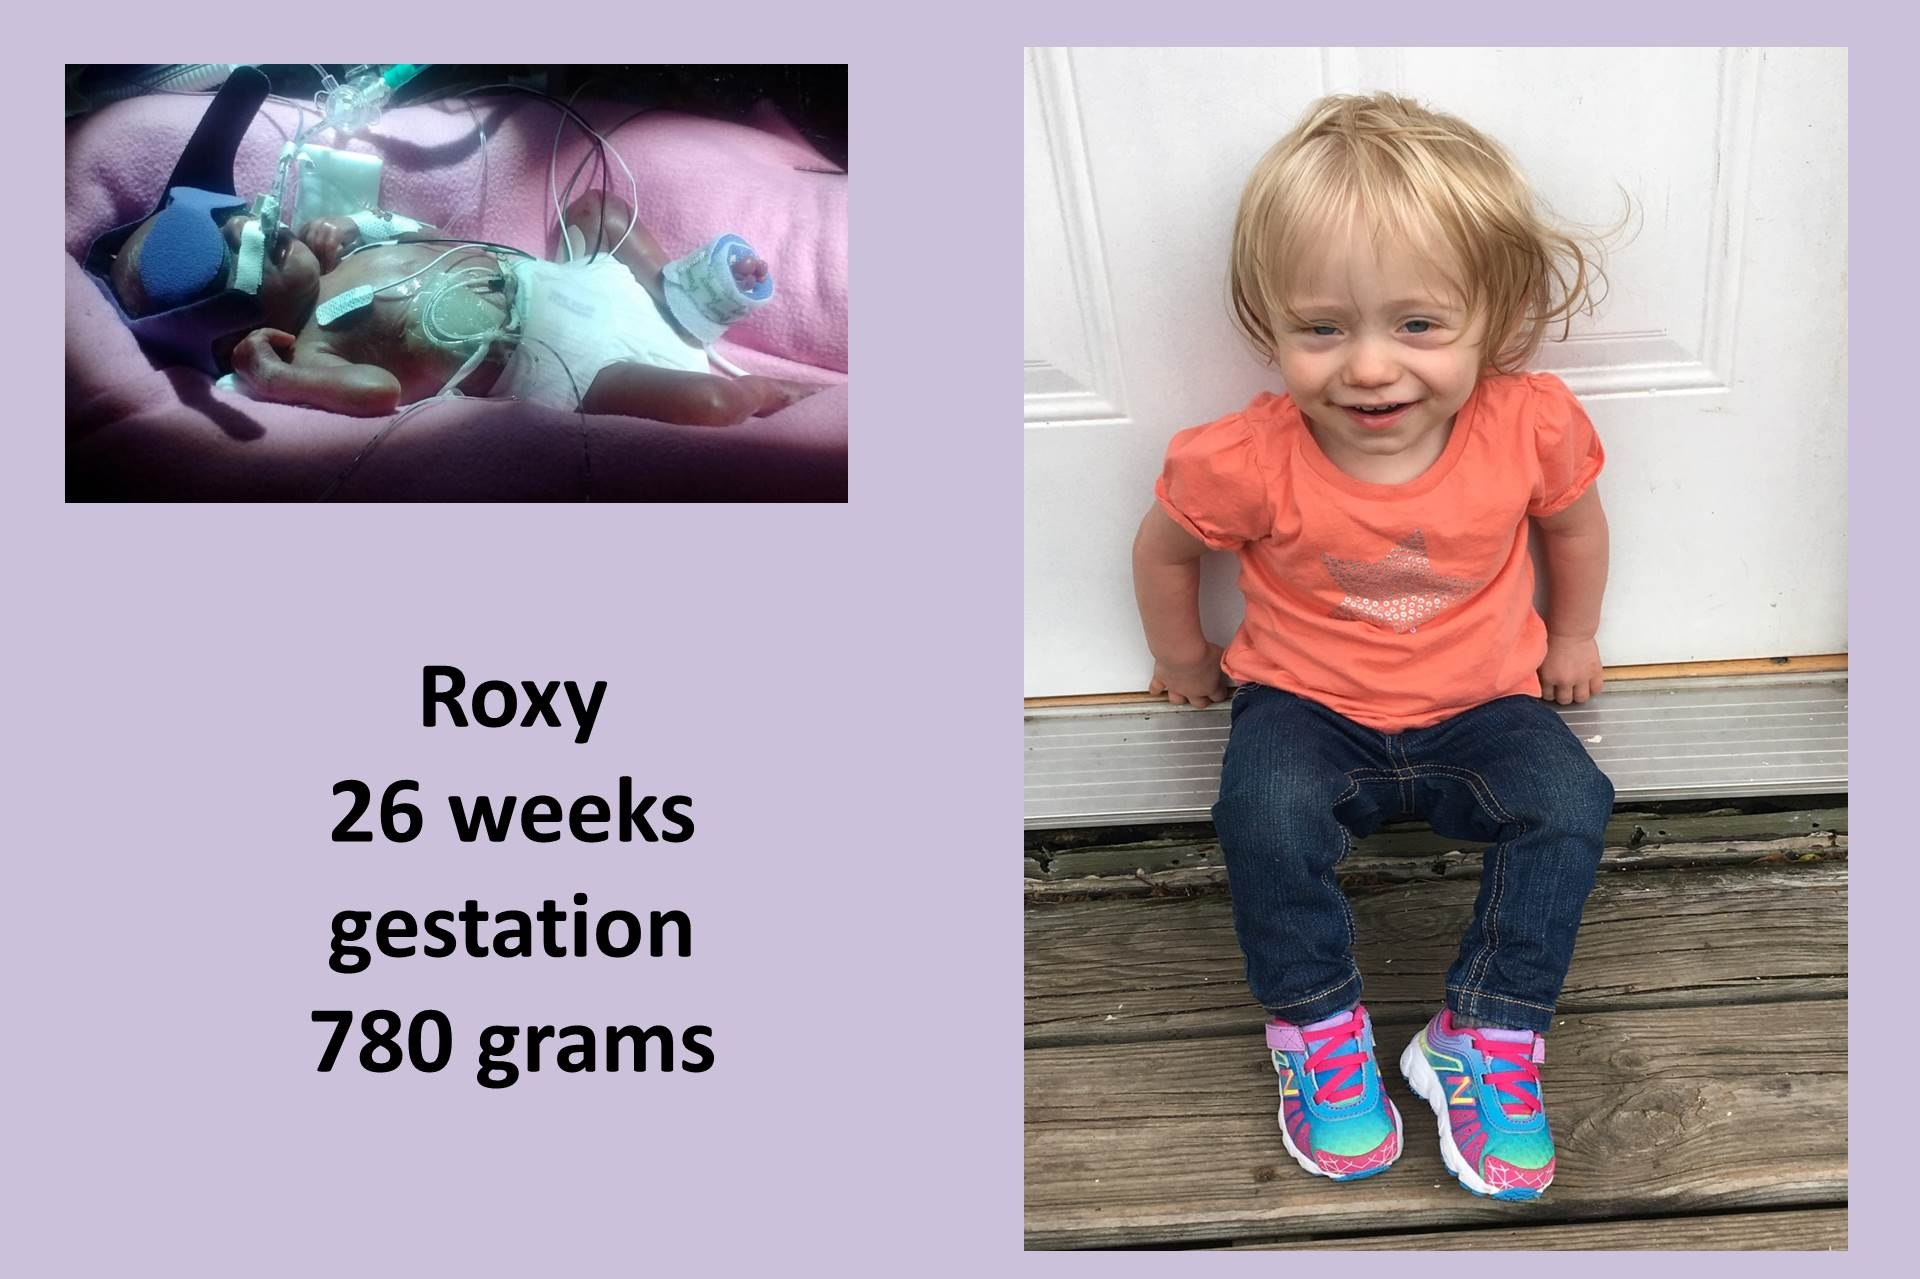 Hallway of Hope: Roxy